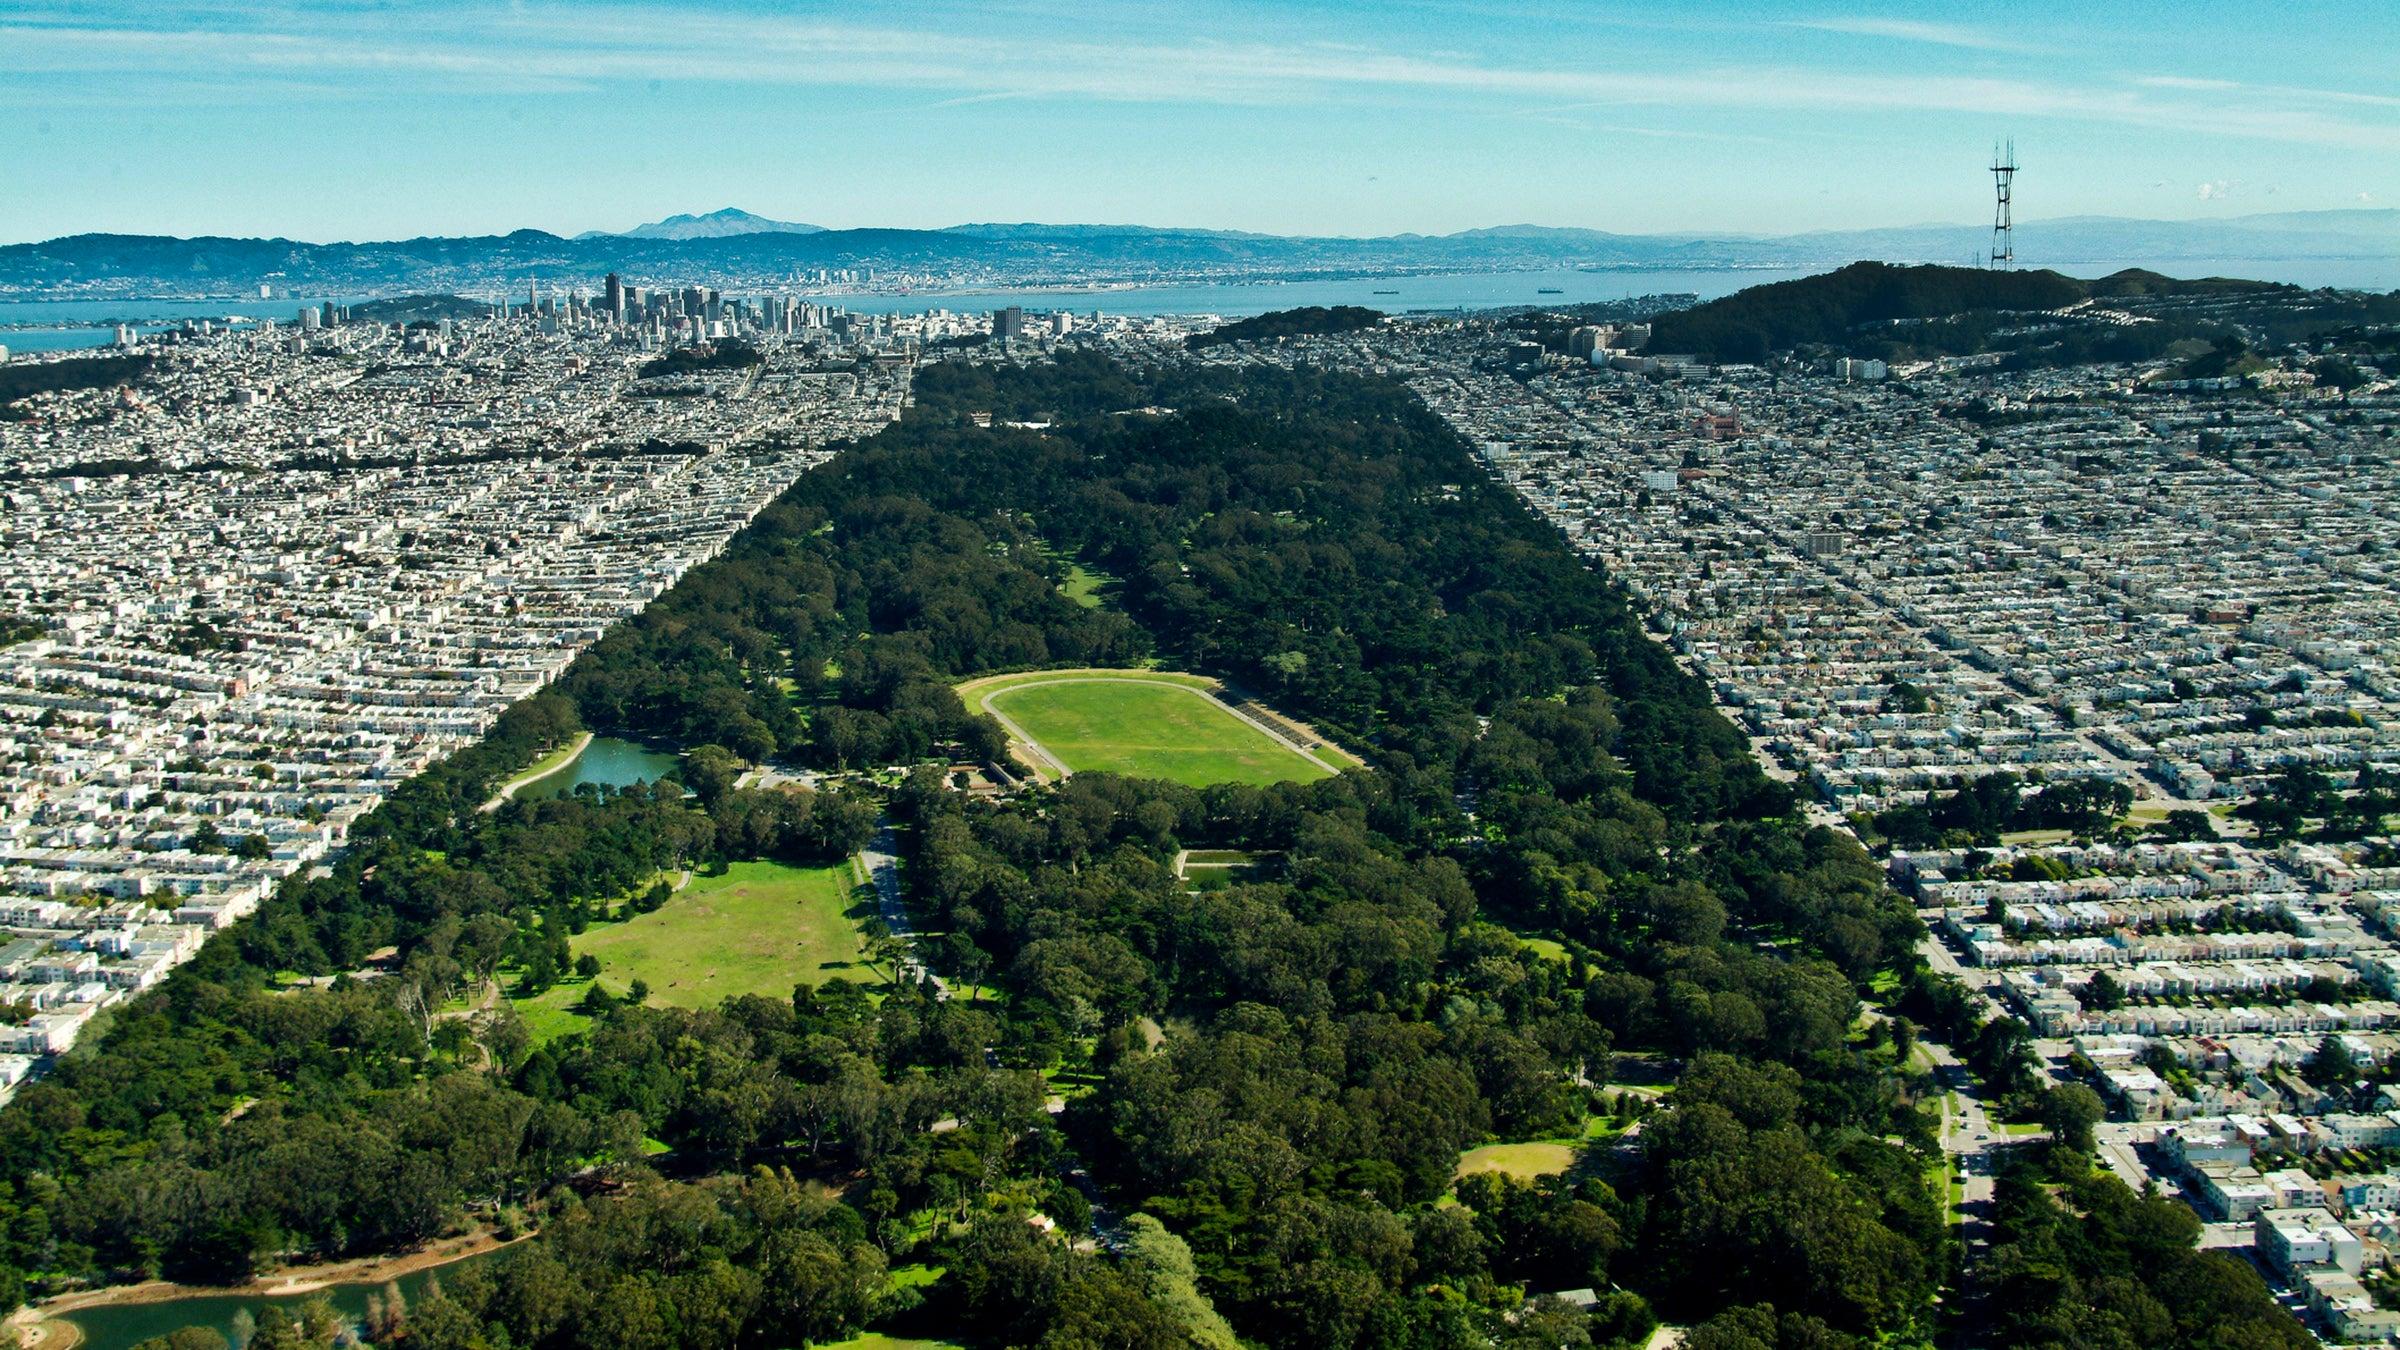 Olmsted's Golden Gate park in San Francisco